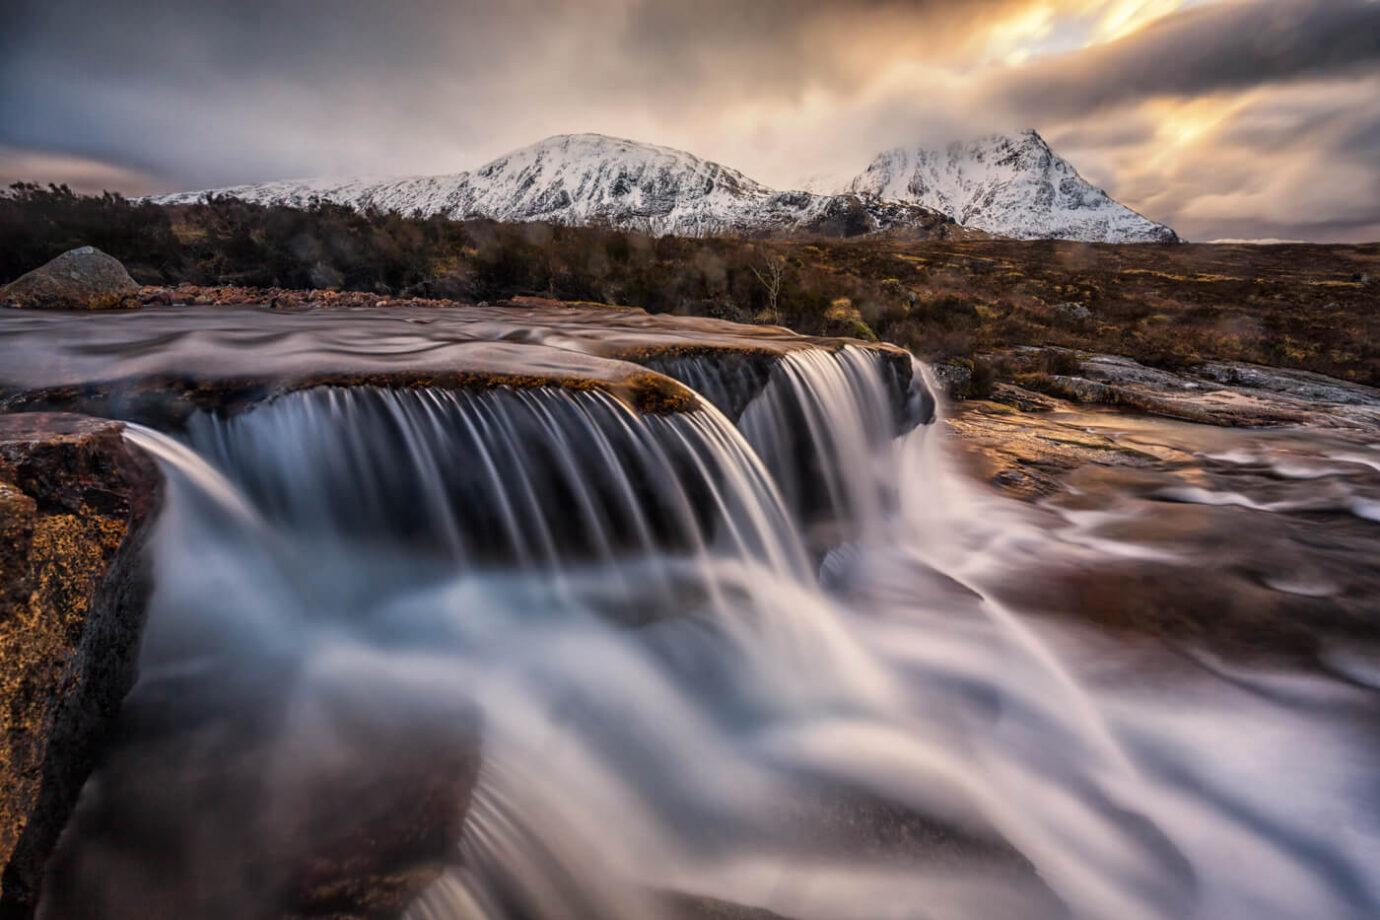 Cauldron Falls, Rannoch Moor, Glencoe, Scotland - Melvin Nicholson Photography